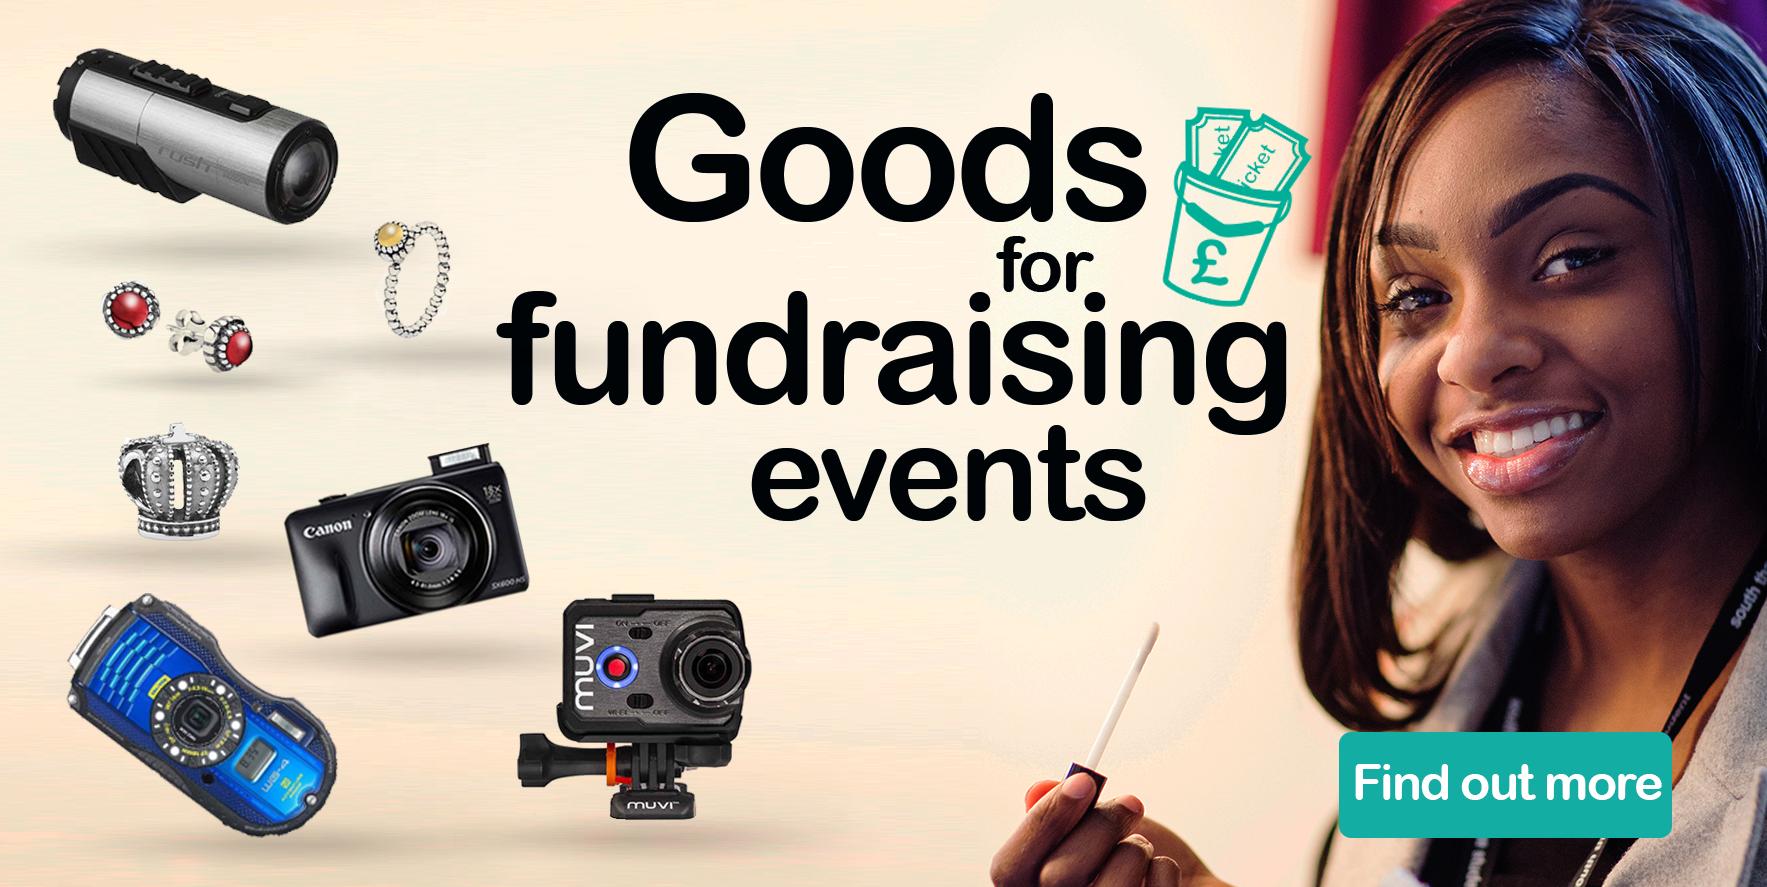 Goods for fundraising